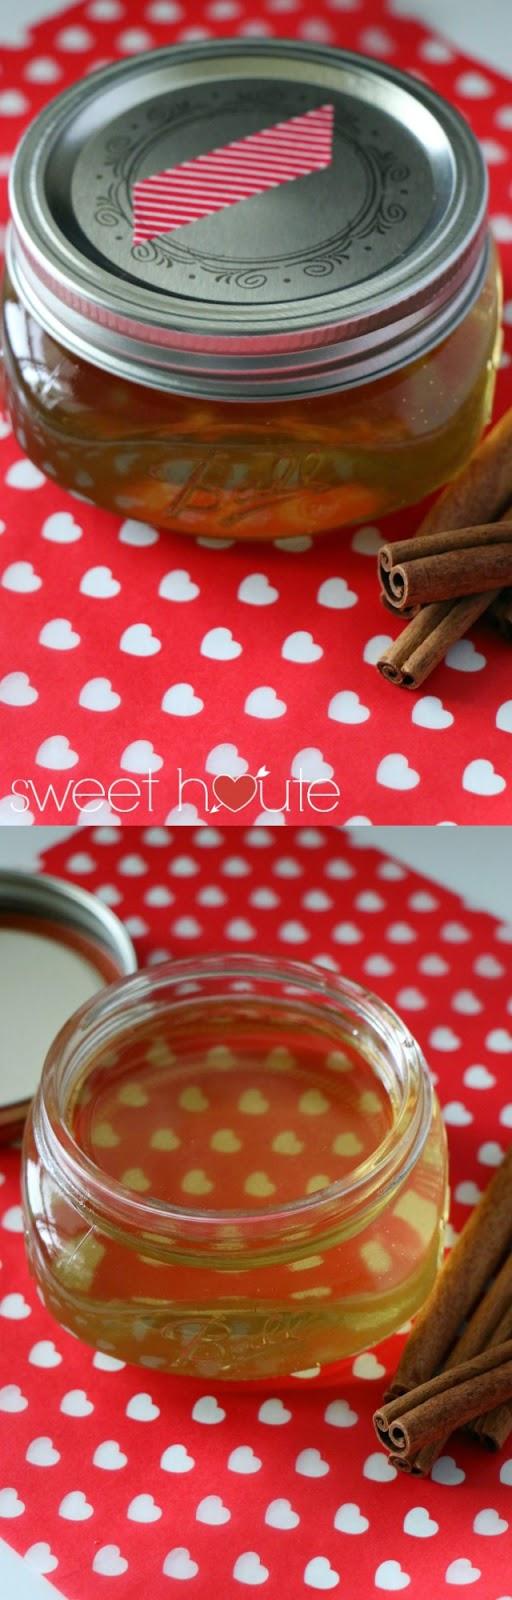 essentail oils massage diy project spa gift cinnamon bun scent